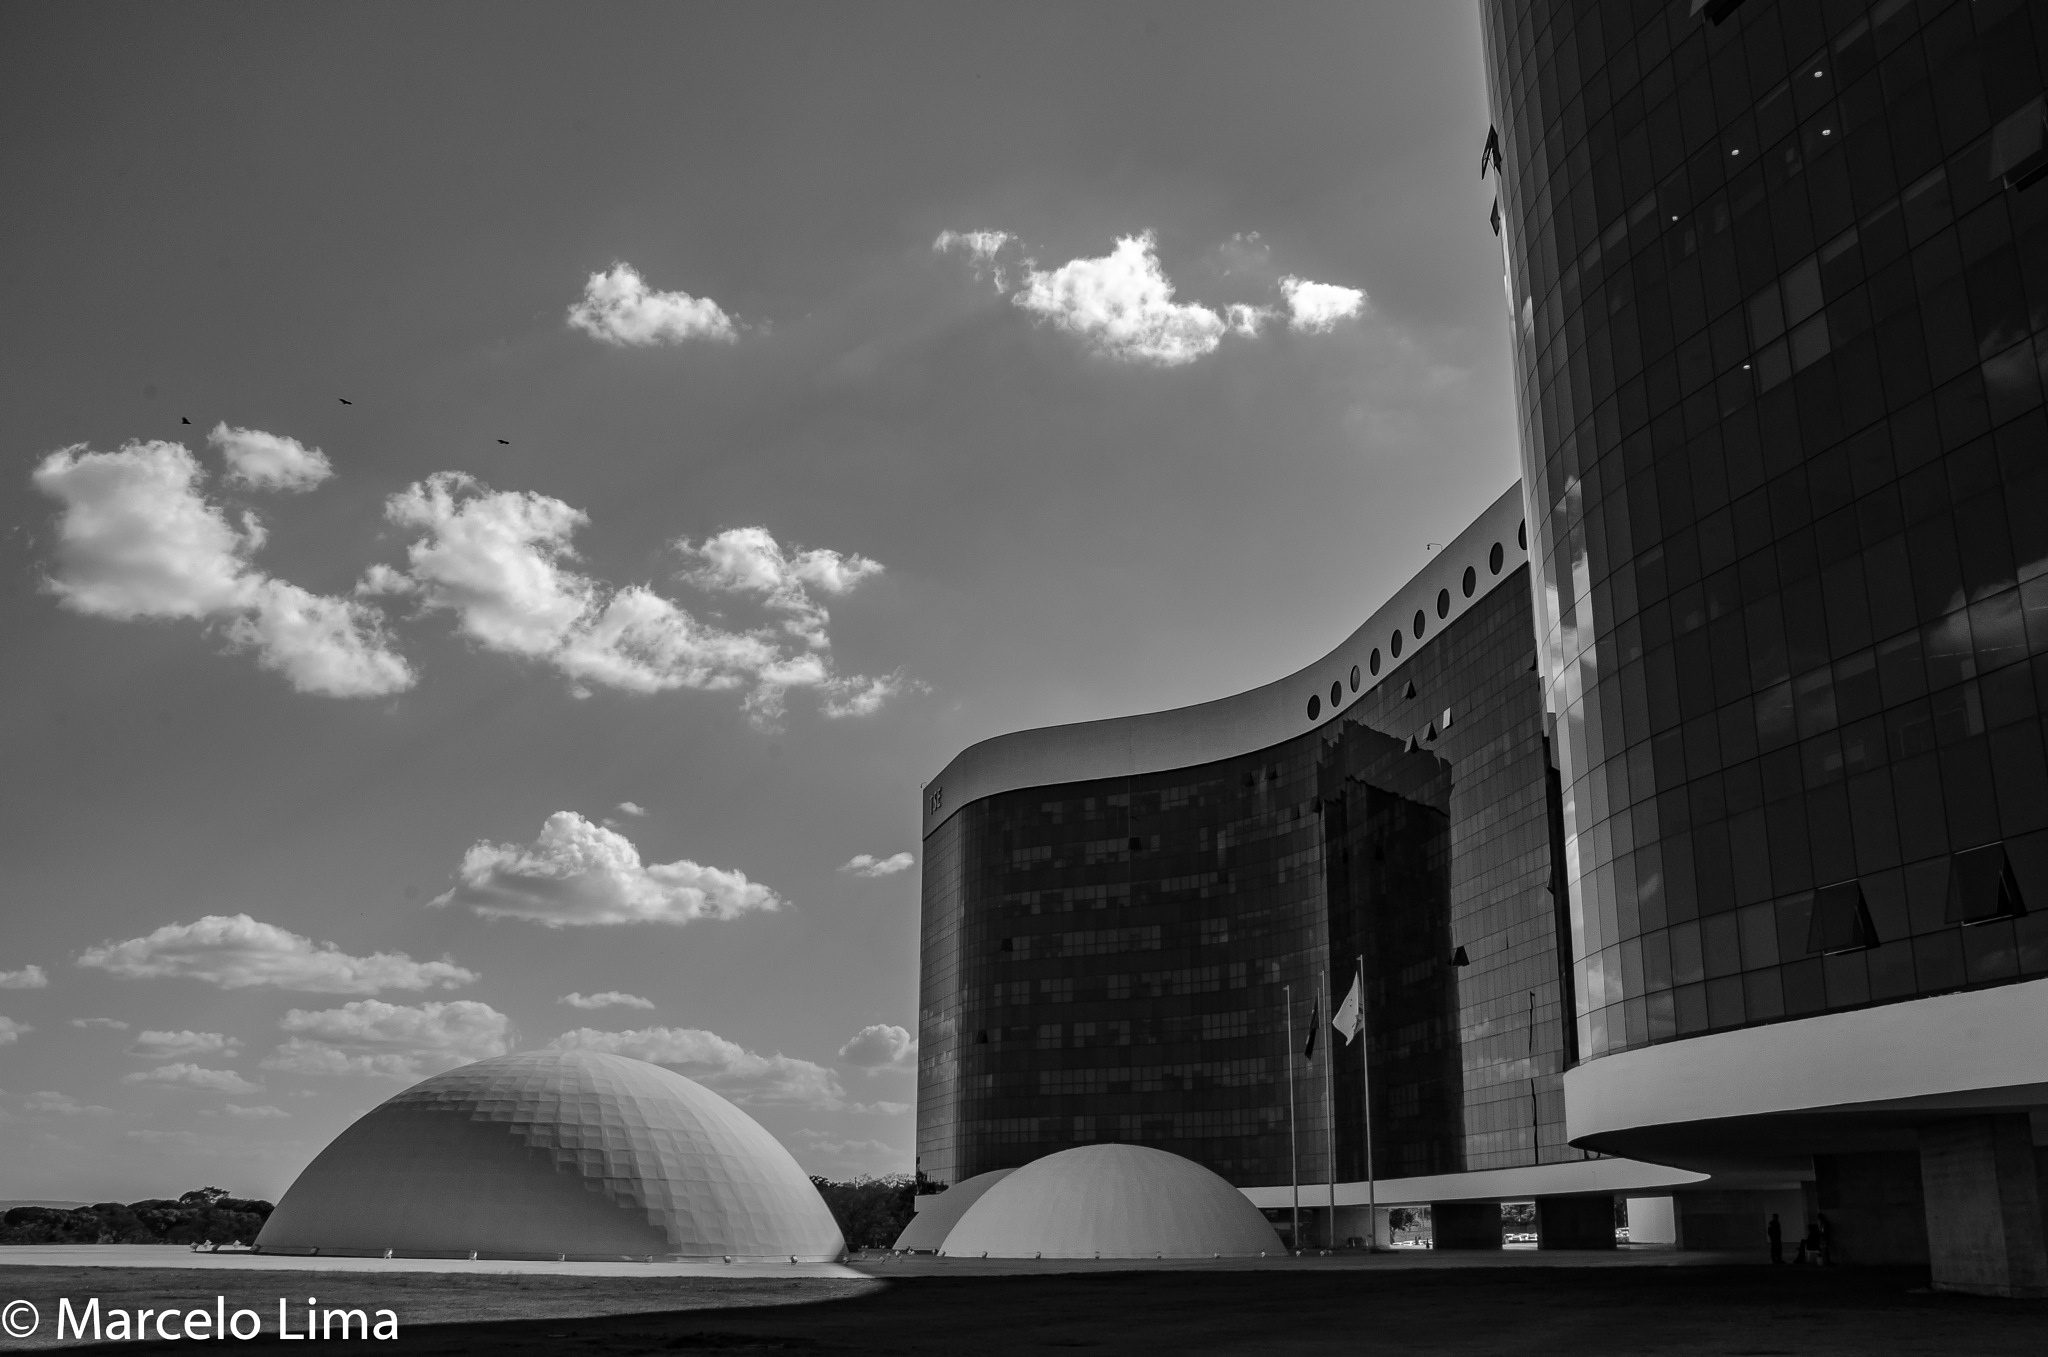 TSE building by Marcelo Lima